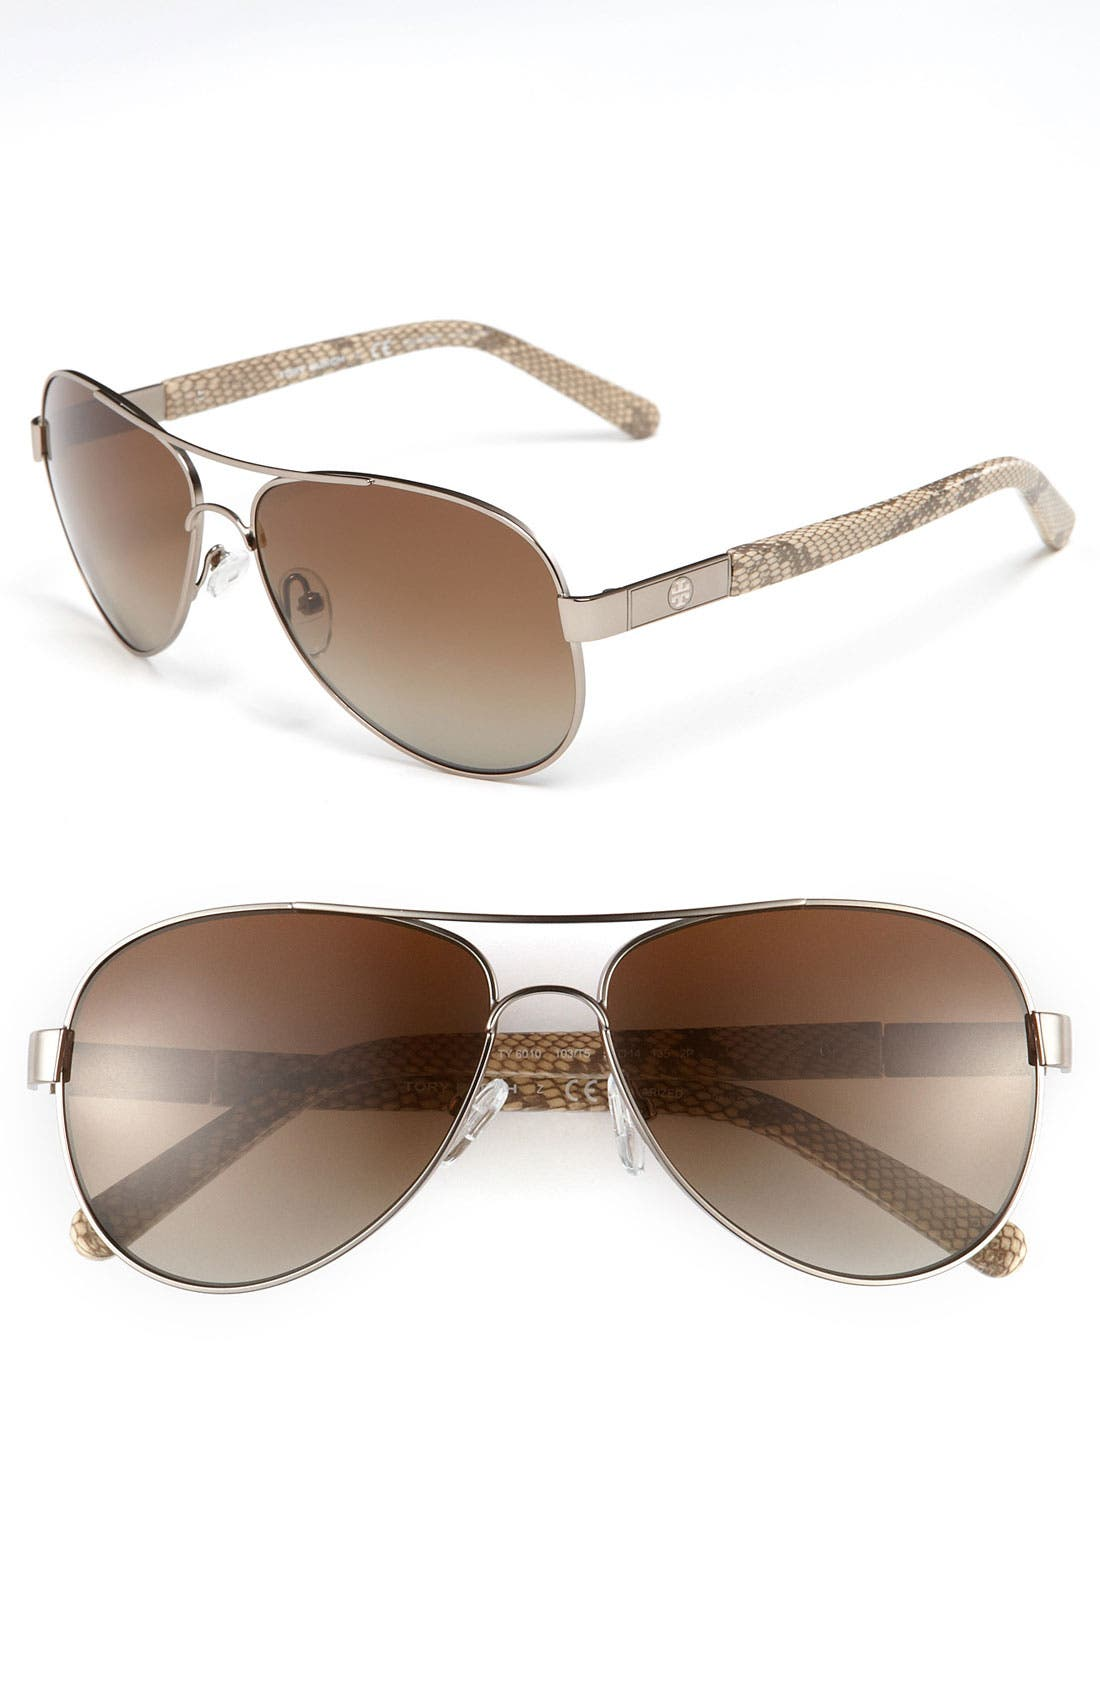 Alternate Image 1 Selected - Tory Burch 'Small' 57mm Polarized Metal Aviator Sunglasses